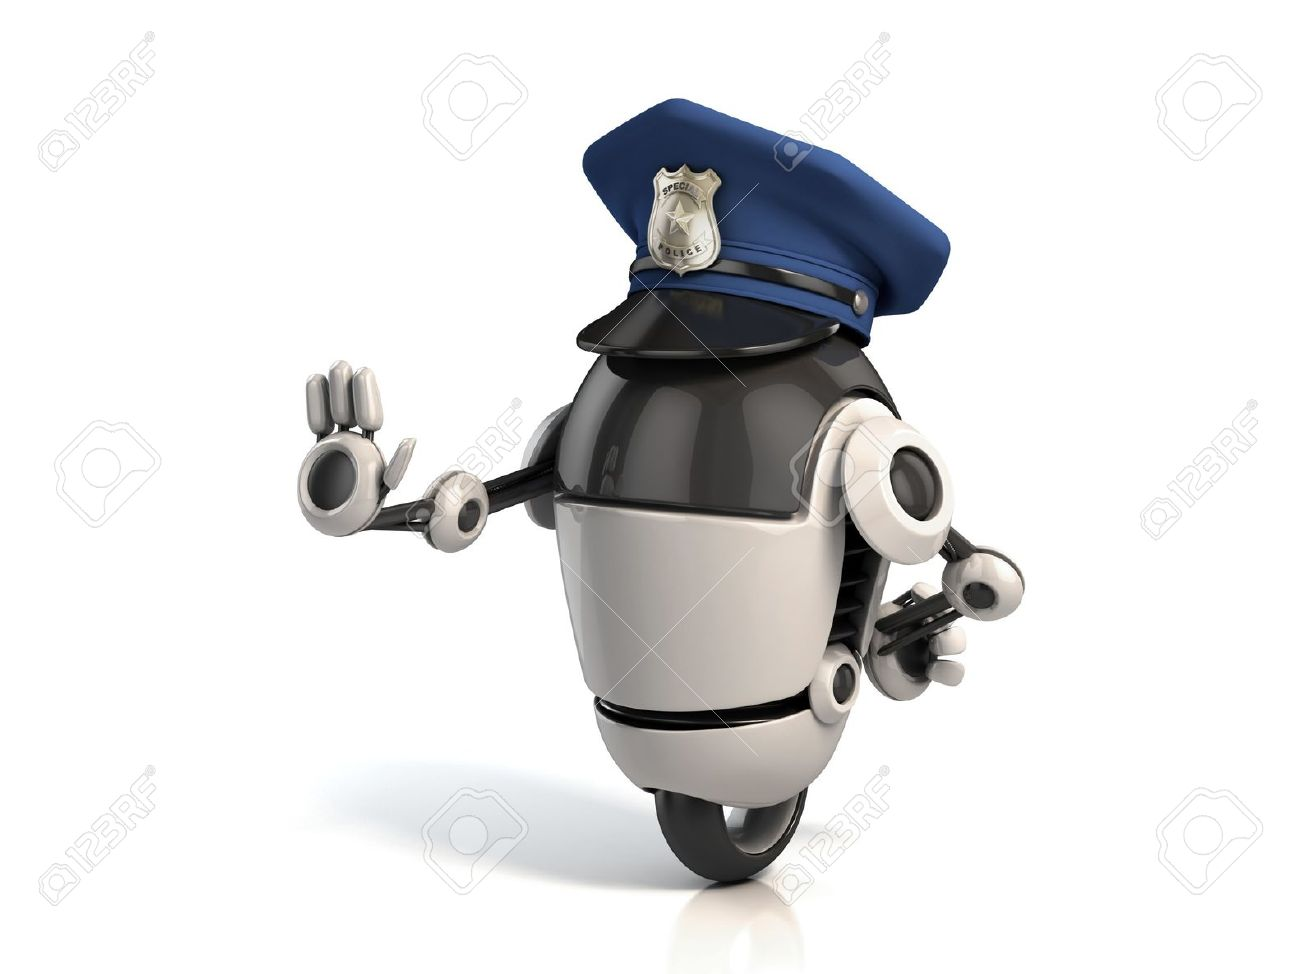 robot policeman Stock Photo - 12331315